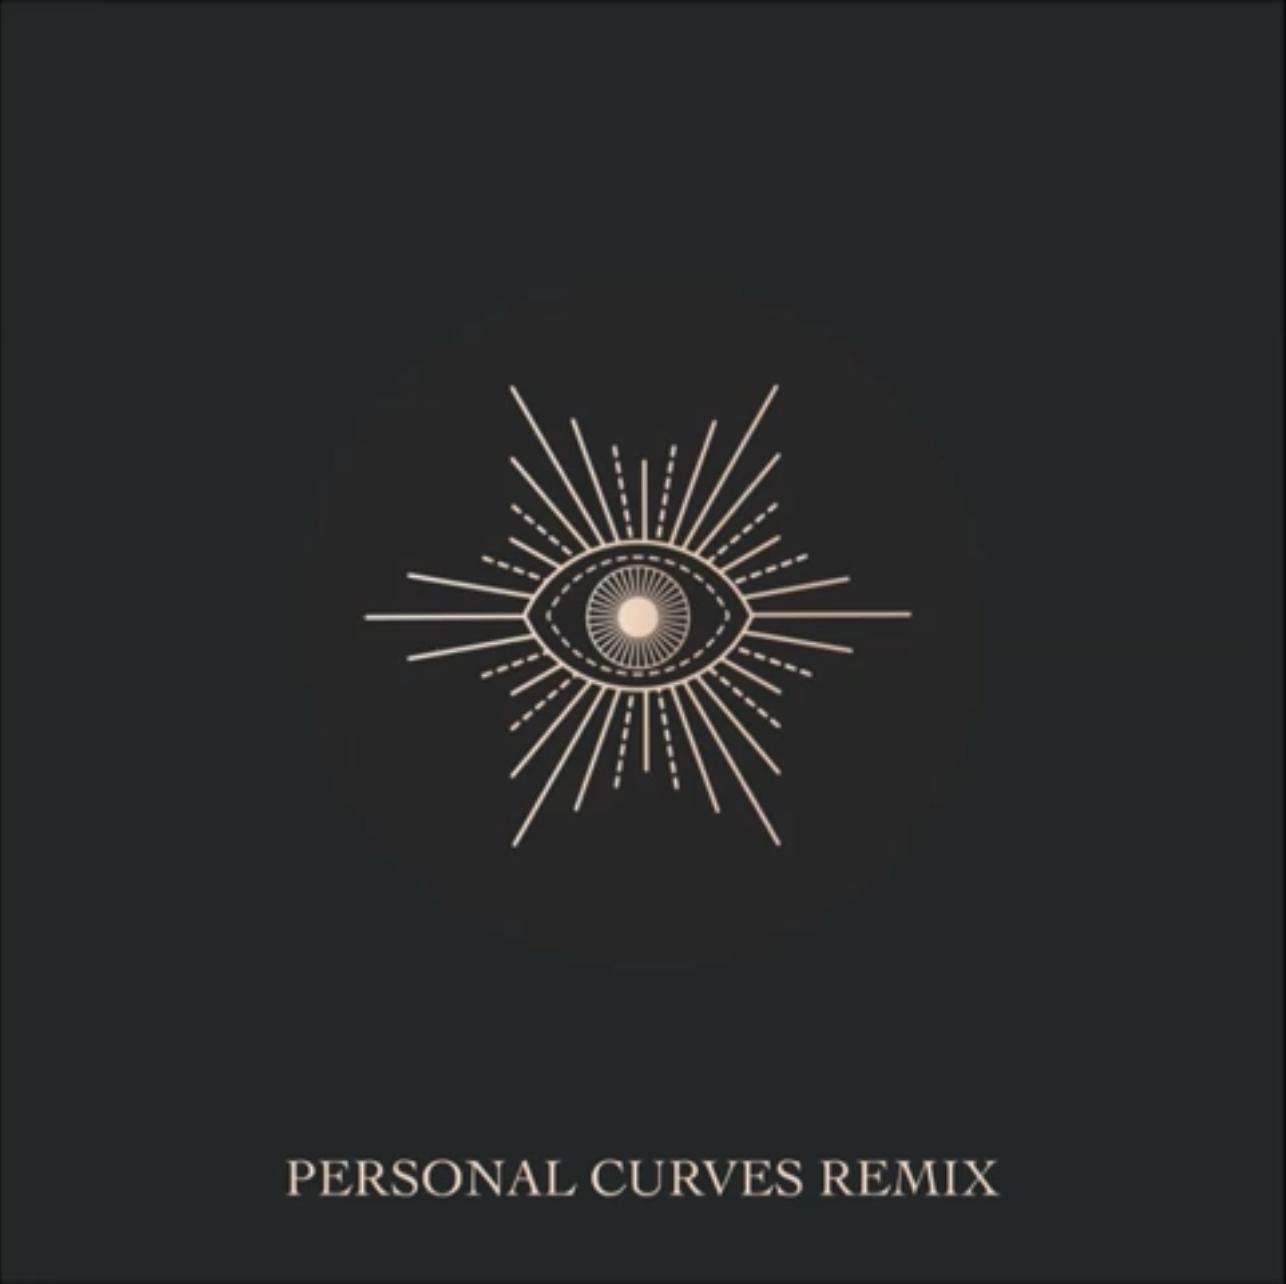 Planet Asia & TrickyTrippz - Personal Curves (Remix) Feat. Styliztik Jones